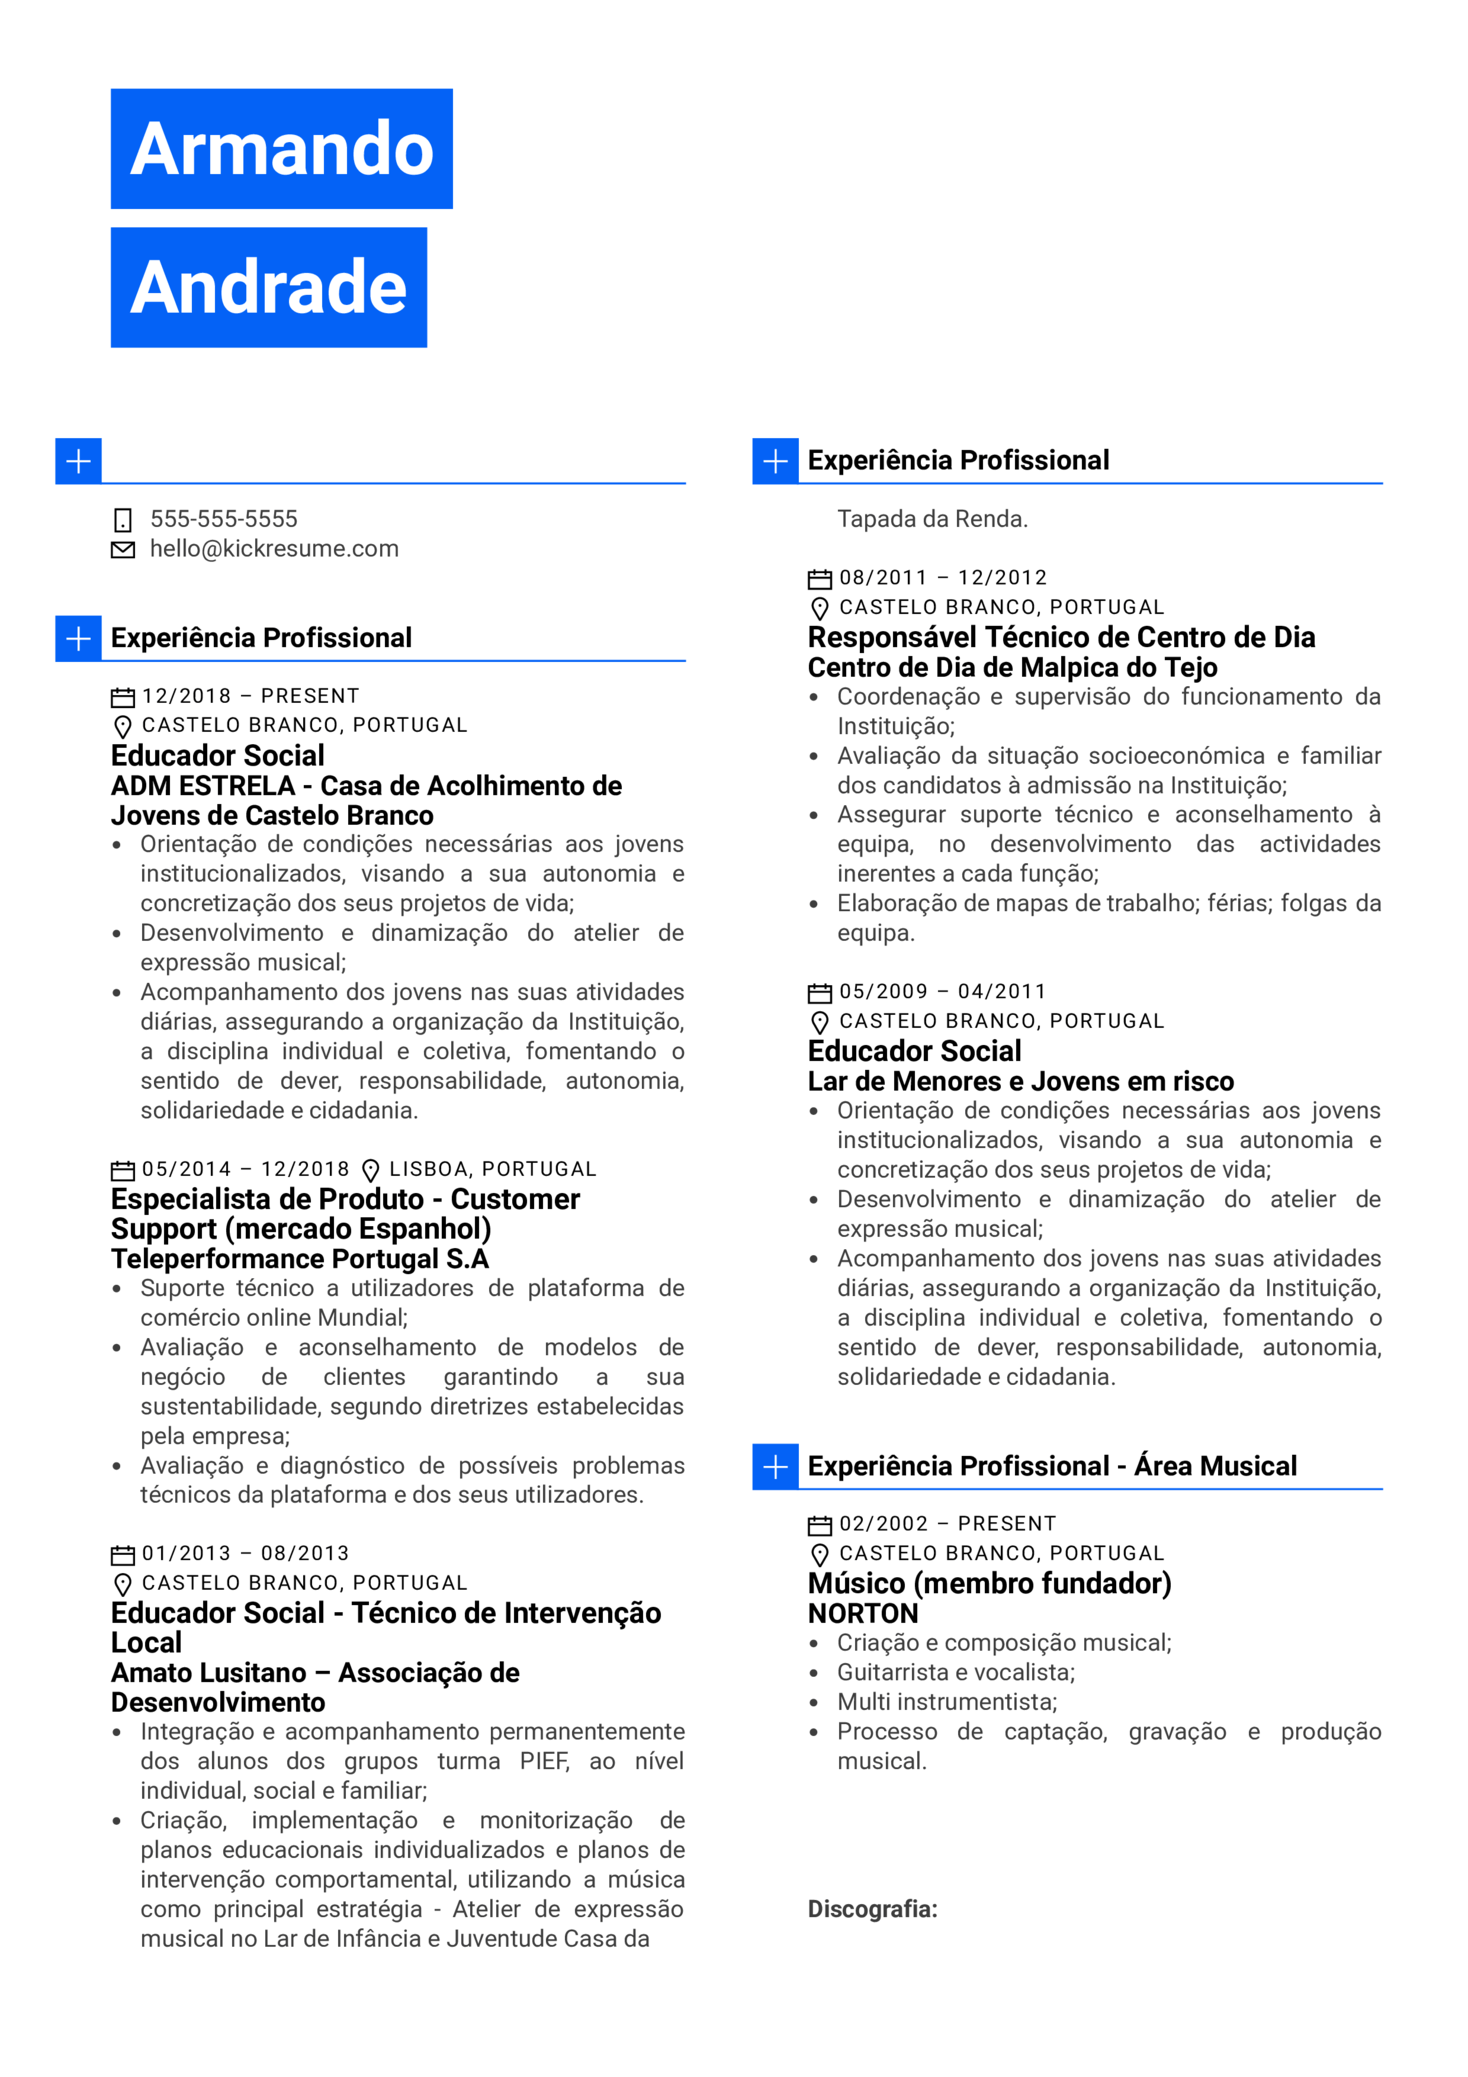 Social Educator Resume Example [ES] (parte 1)